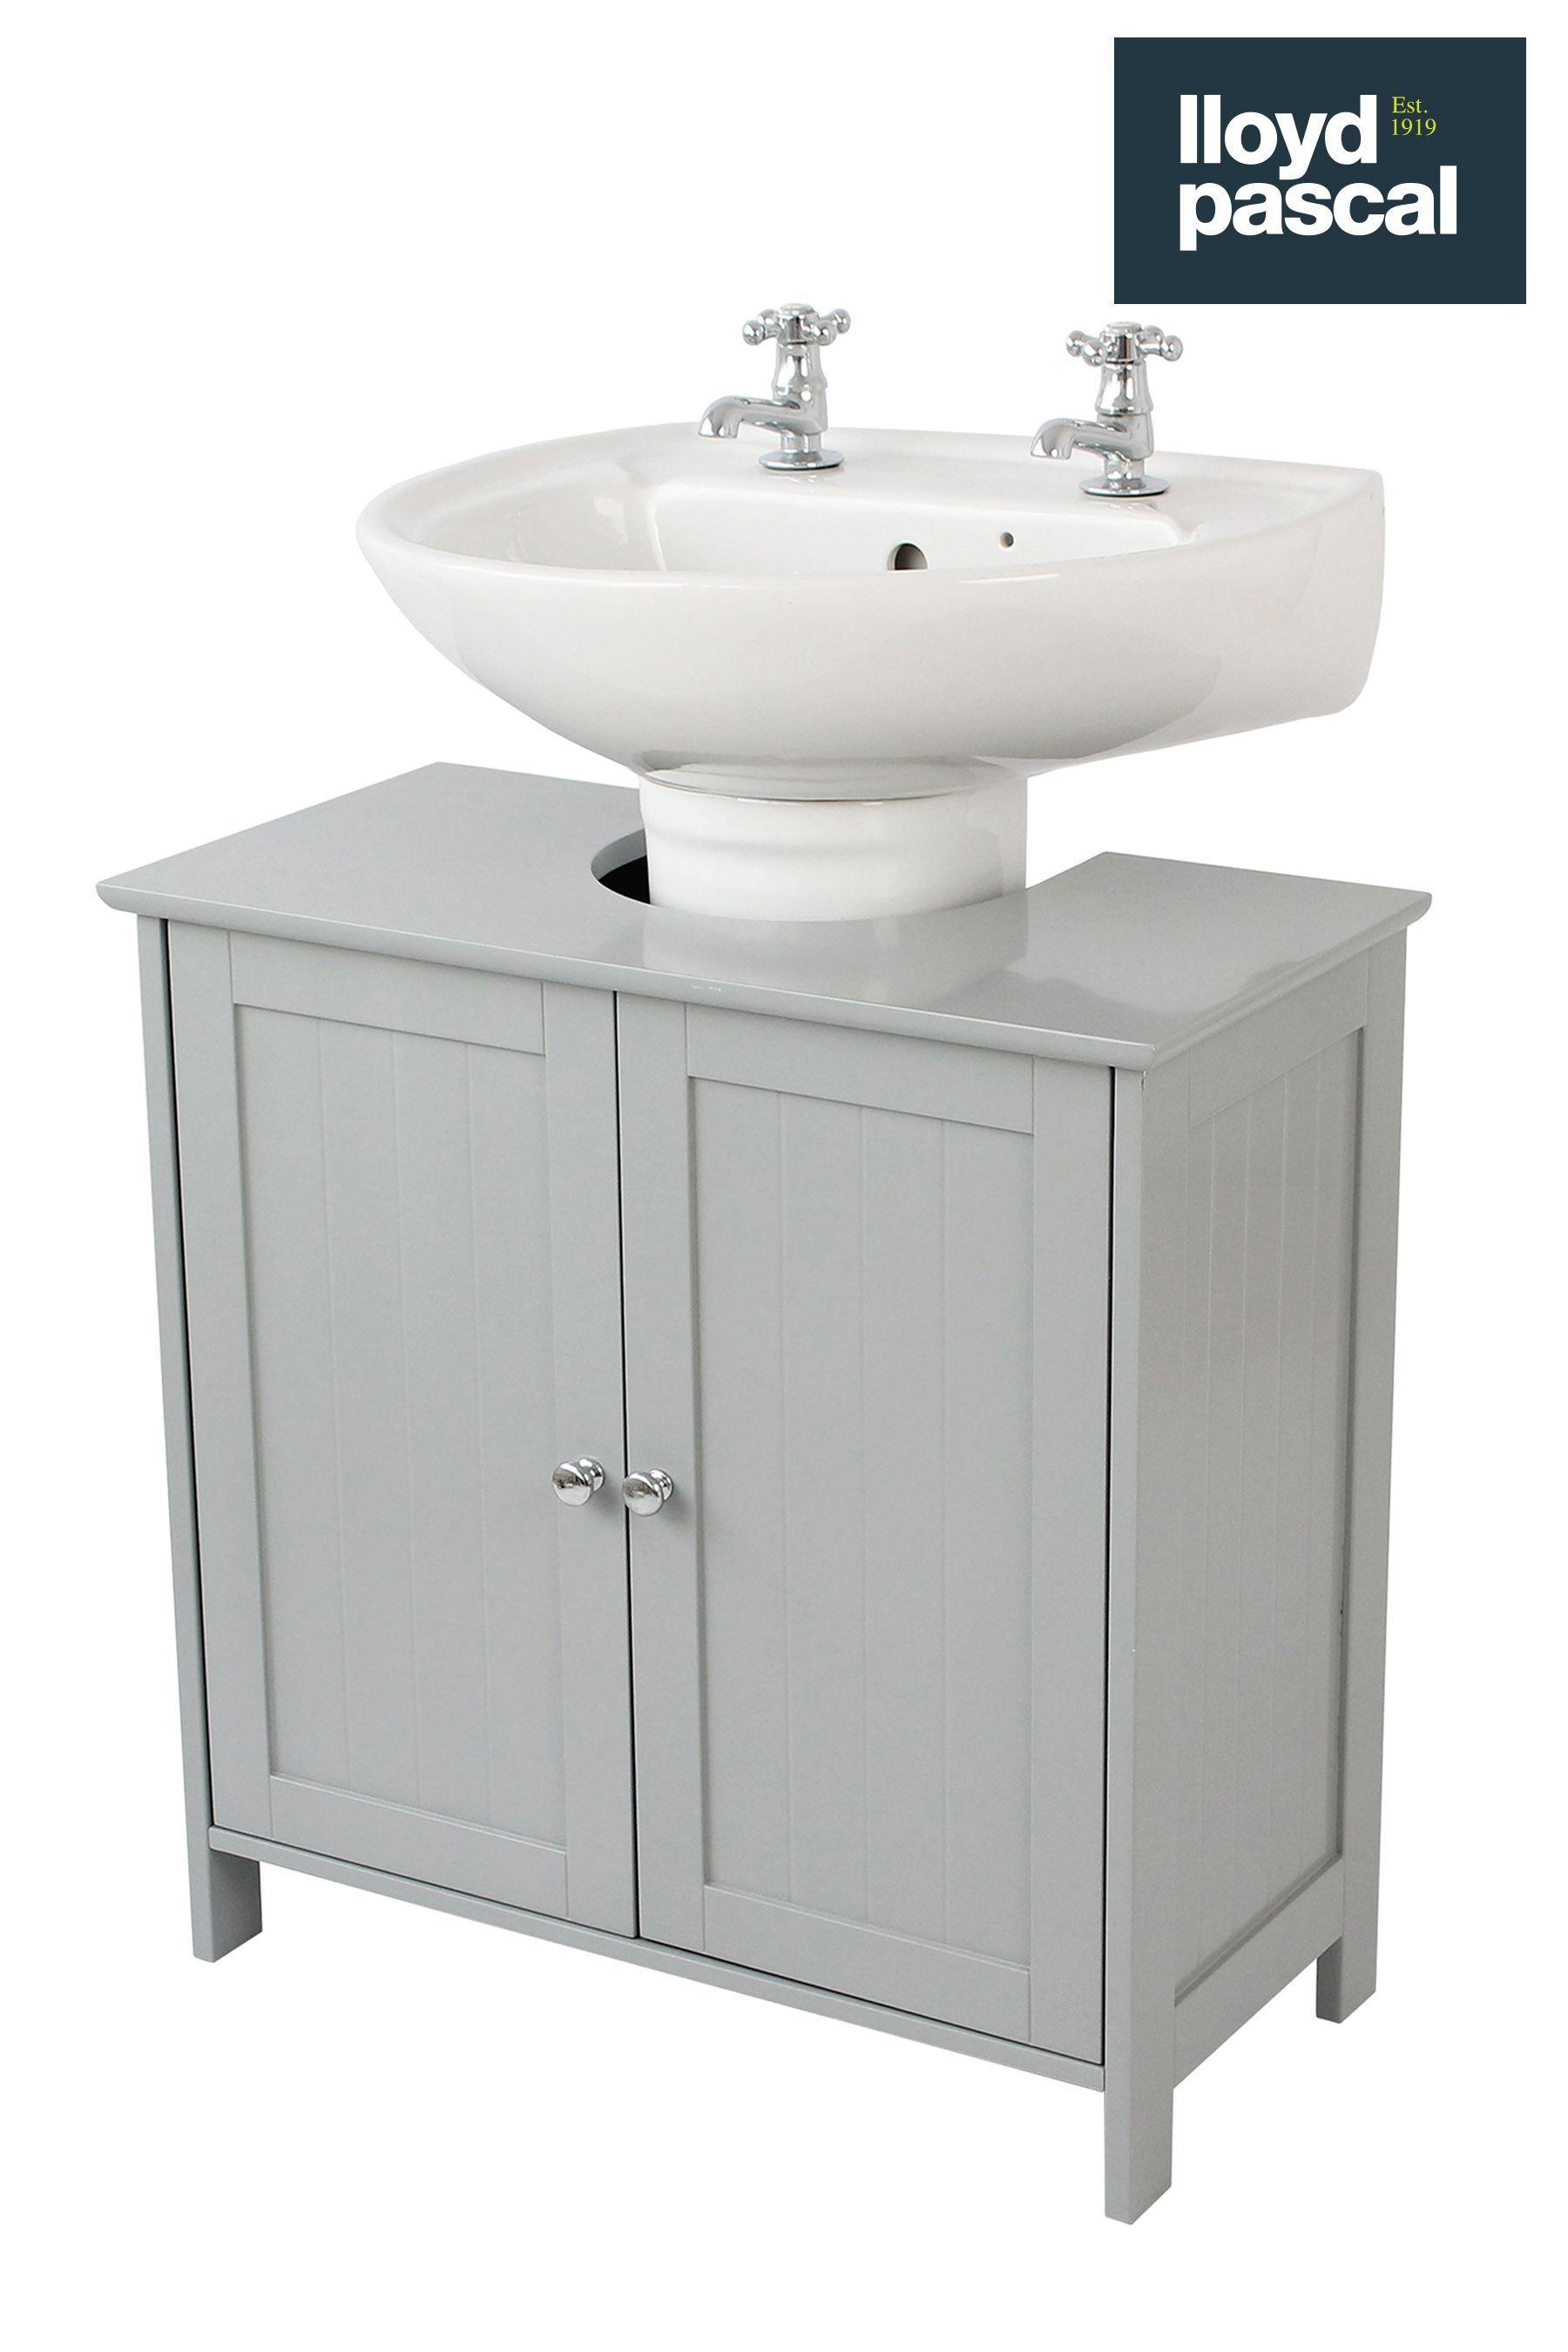 Lloyd Pascal Grey Painted Under Sink Storage Grey Under Sink Storage Sink Storage Small Bathroom Storage